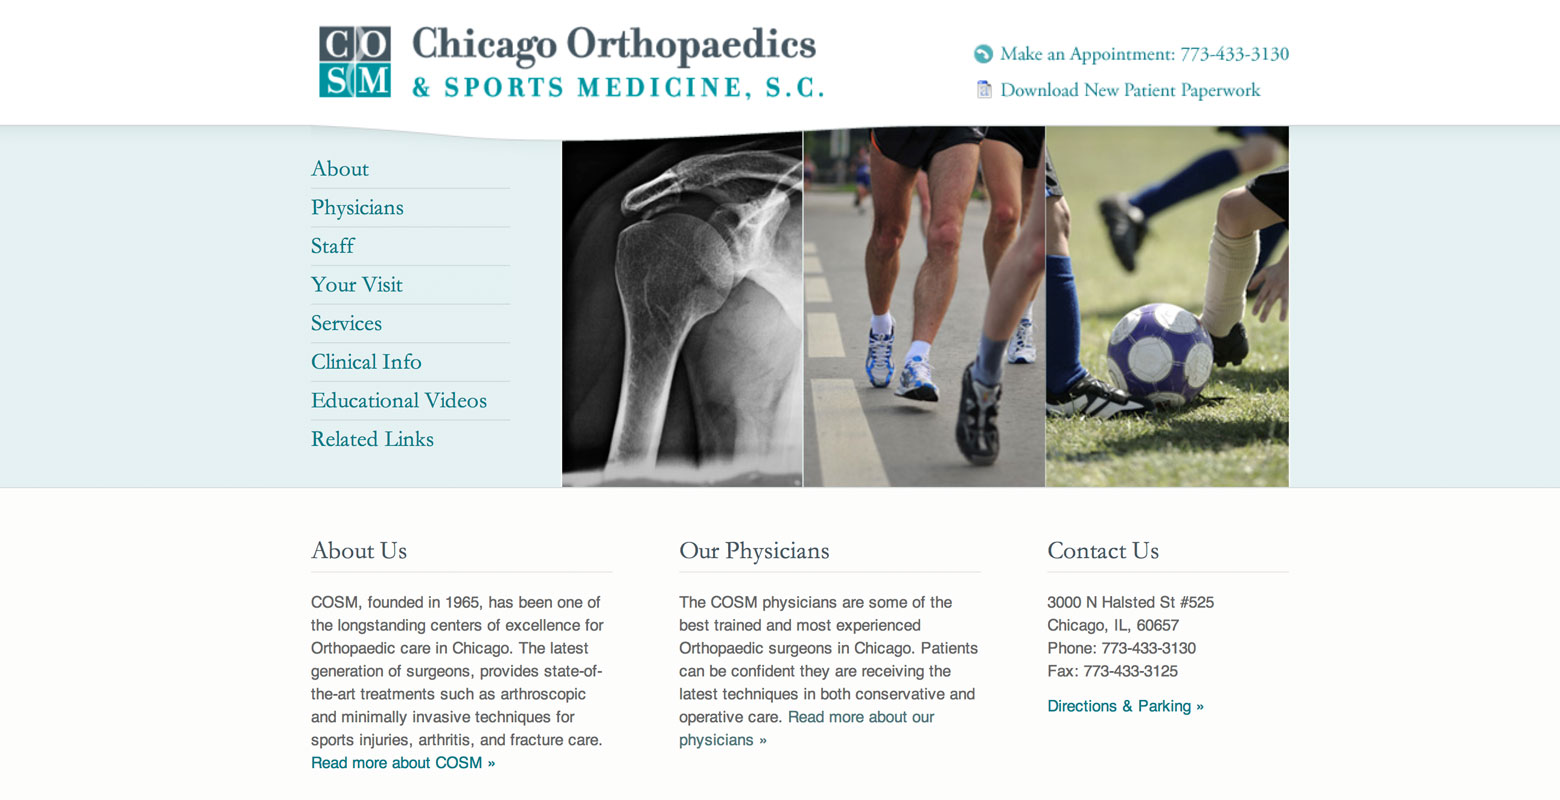 Chicago Orthopaedics & Sports Medicine, S.C.